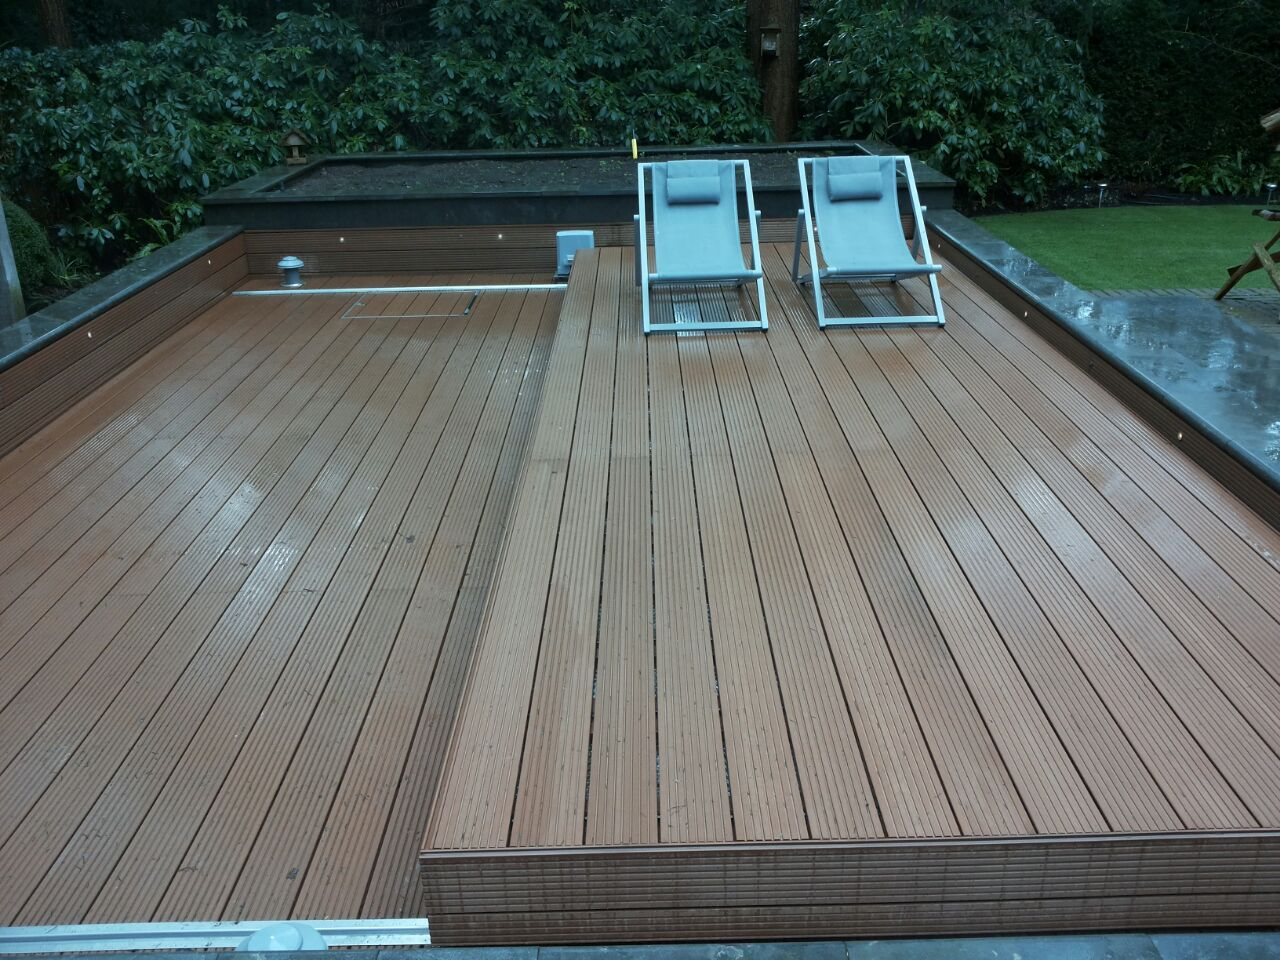 Rolling Deck Automatic Hot Tub Swim Spa Pool Cover Wooden Pool Deck Hot Tub Swim Spa Hot Tub Cover